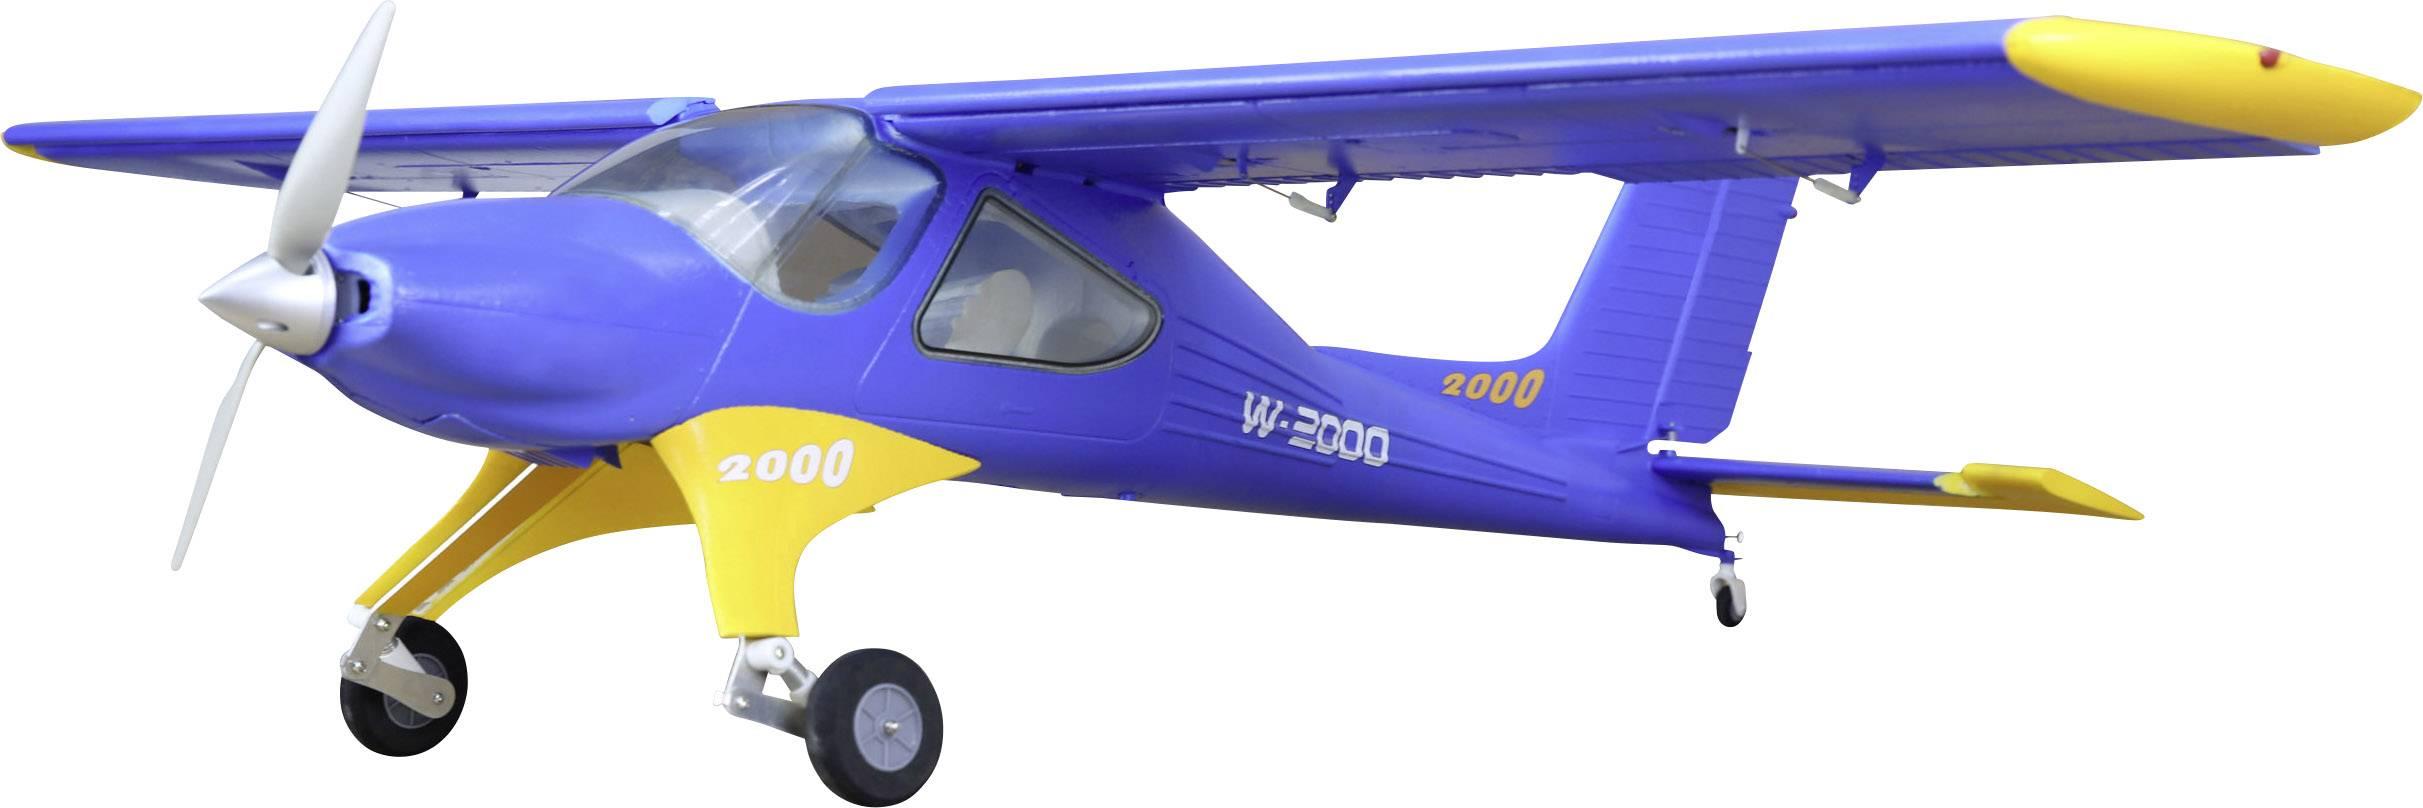 RC model motorového letadla Reely W-2000 3009, ARF, rozpětí 1330 mm